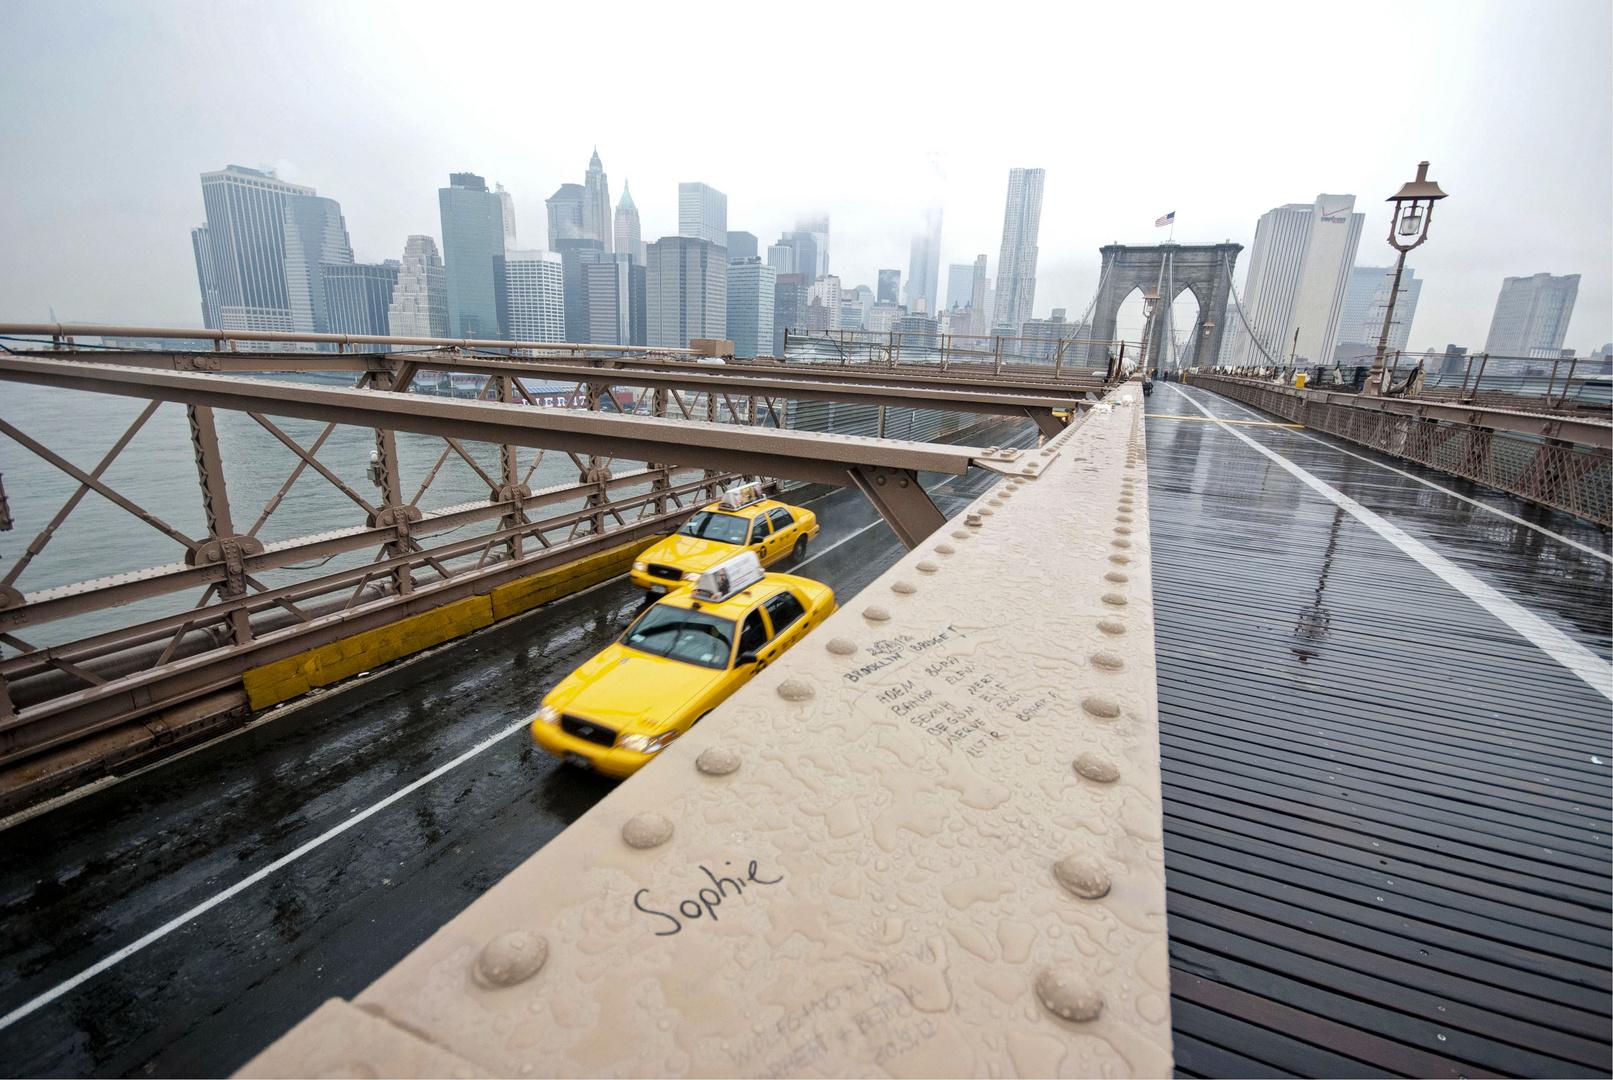 New York - Brooklyn Bridge - 15